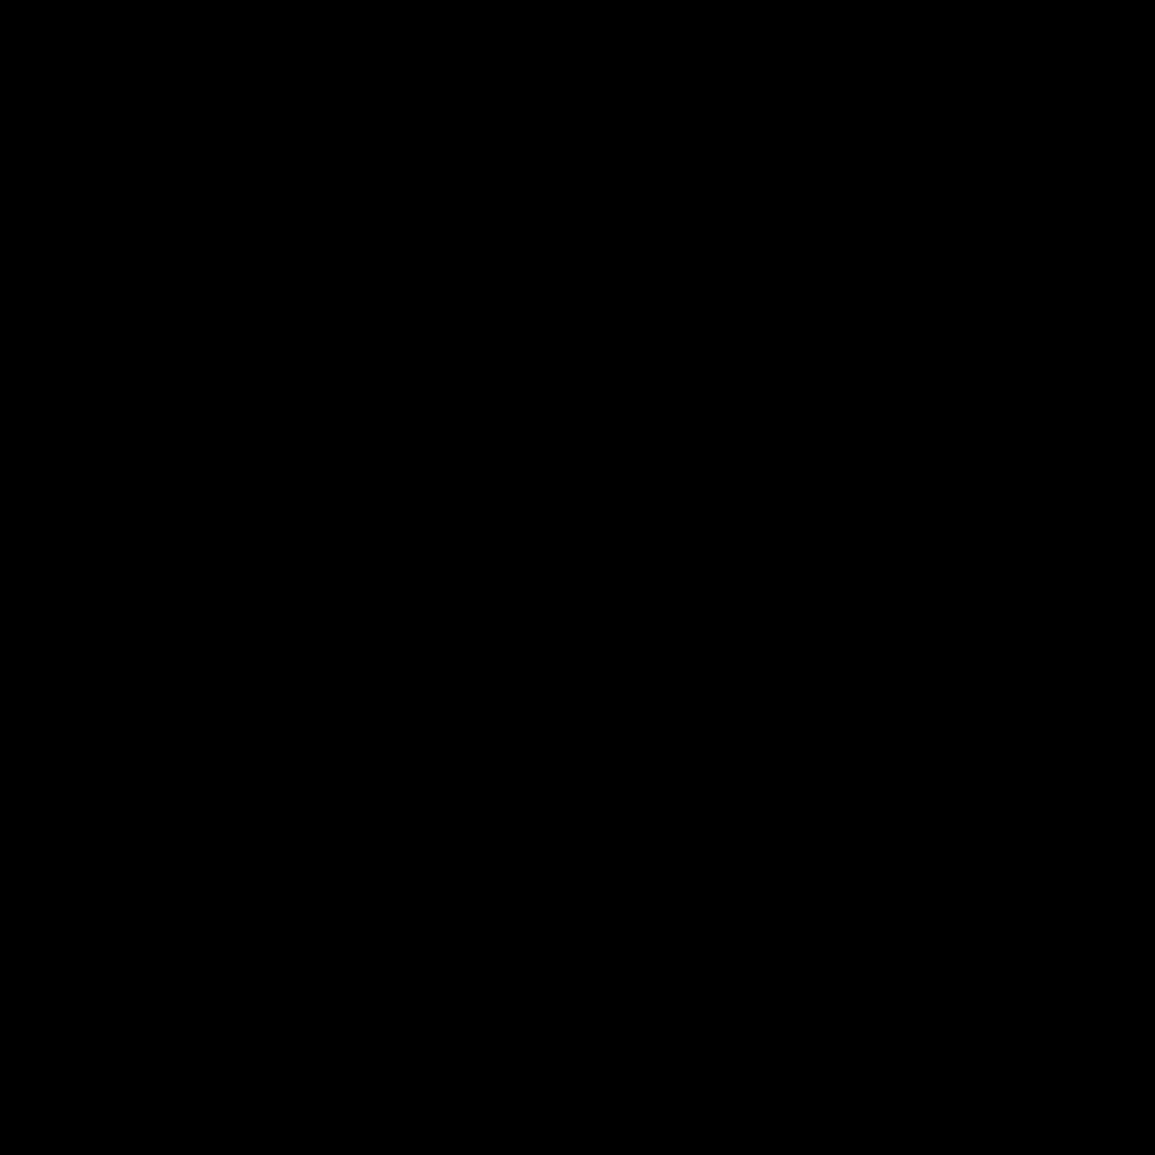 淡古印 AL-KL 字形見本